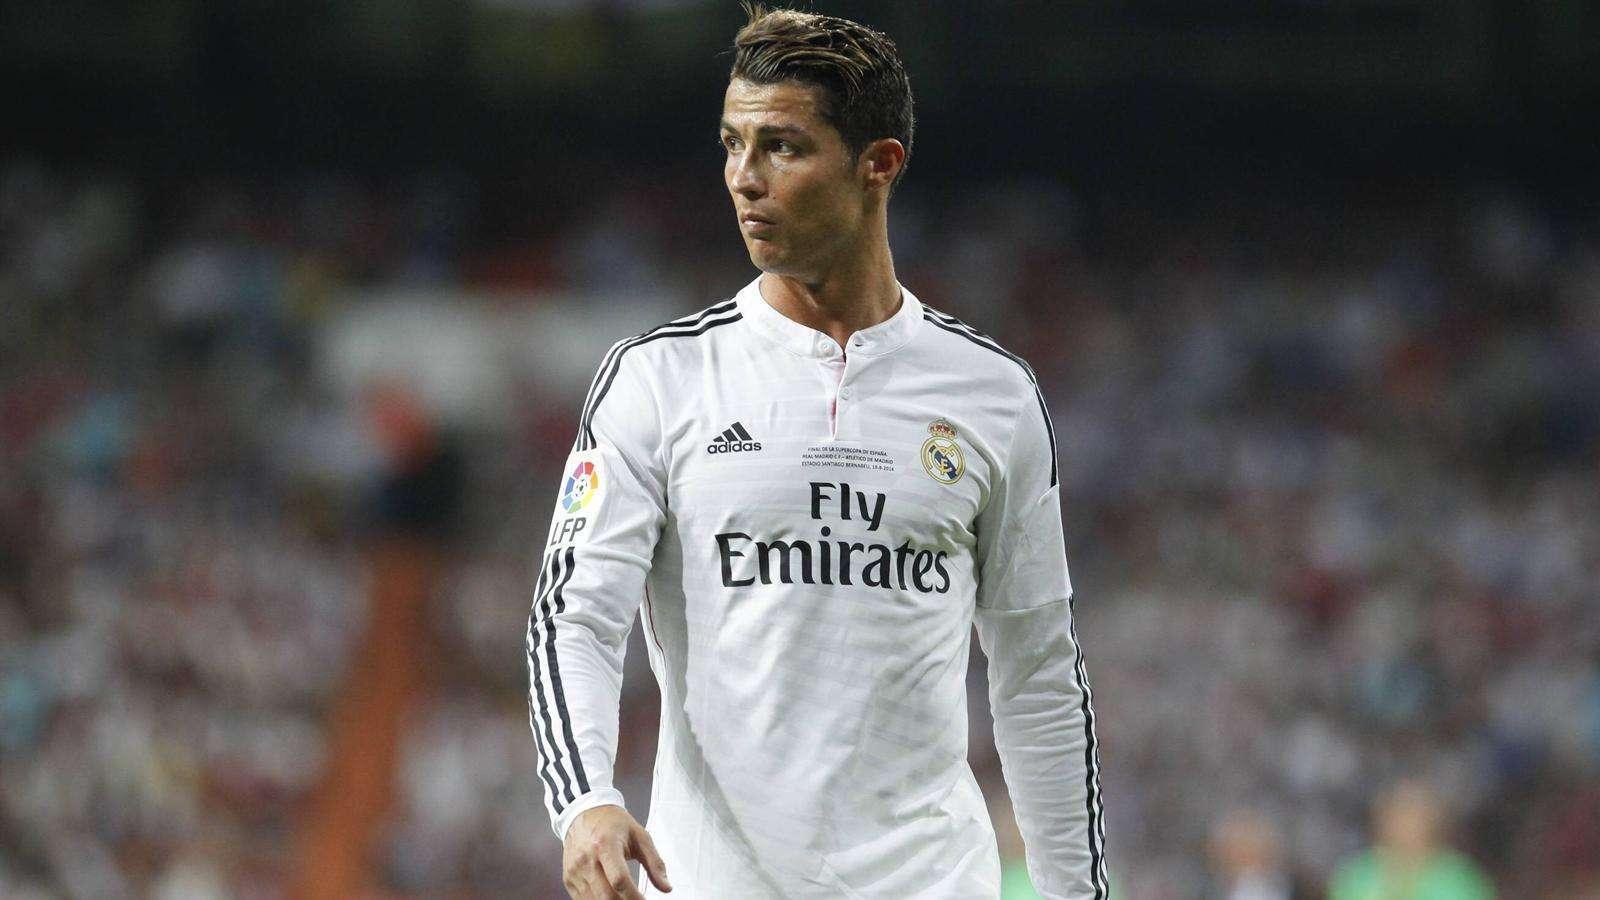 Wallpaper - Messi Vs Ronaldo 2015 , HD Wallpaper & Backgrounds